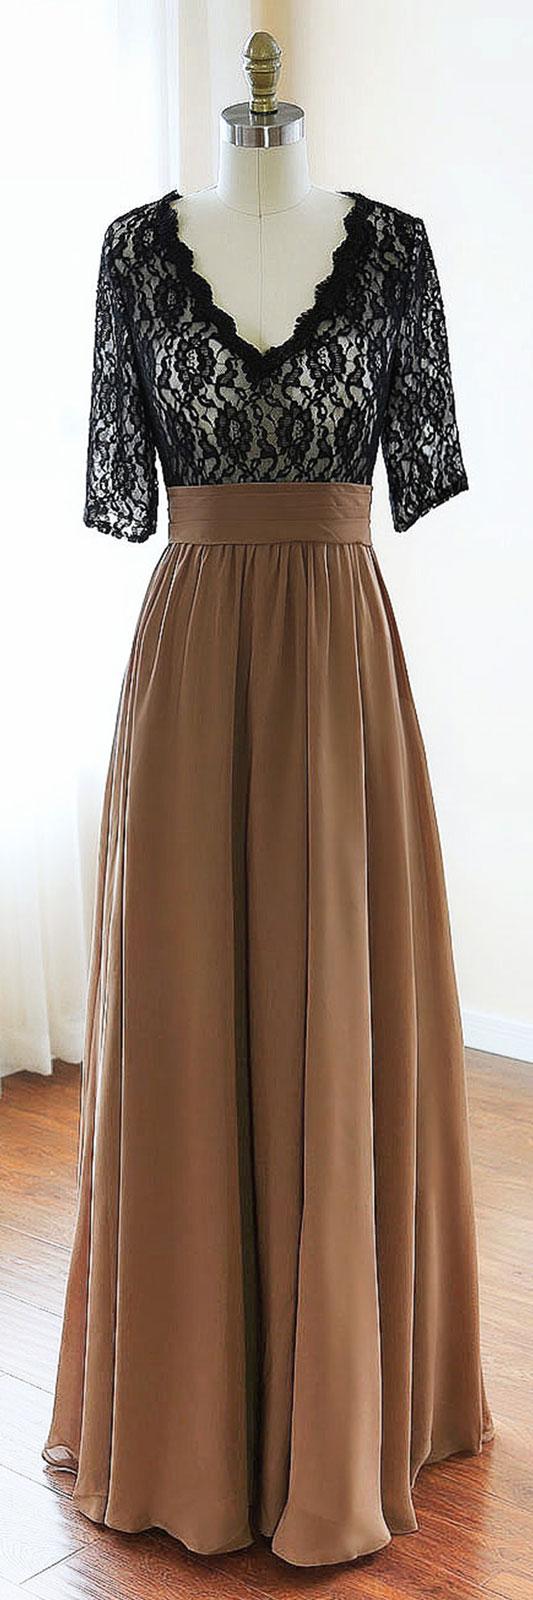 Black v neck chiffon lace long prom dress black evening dress